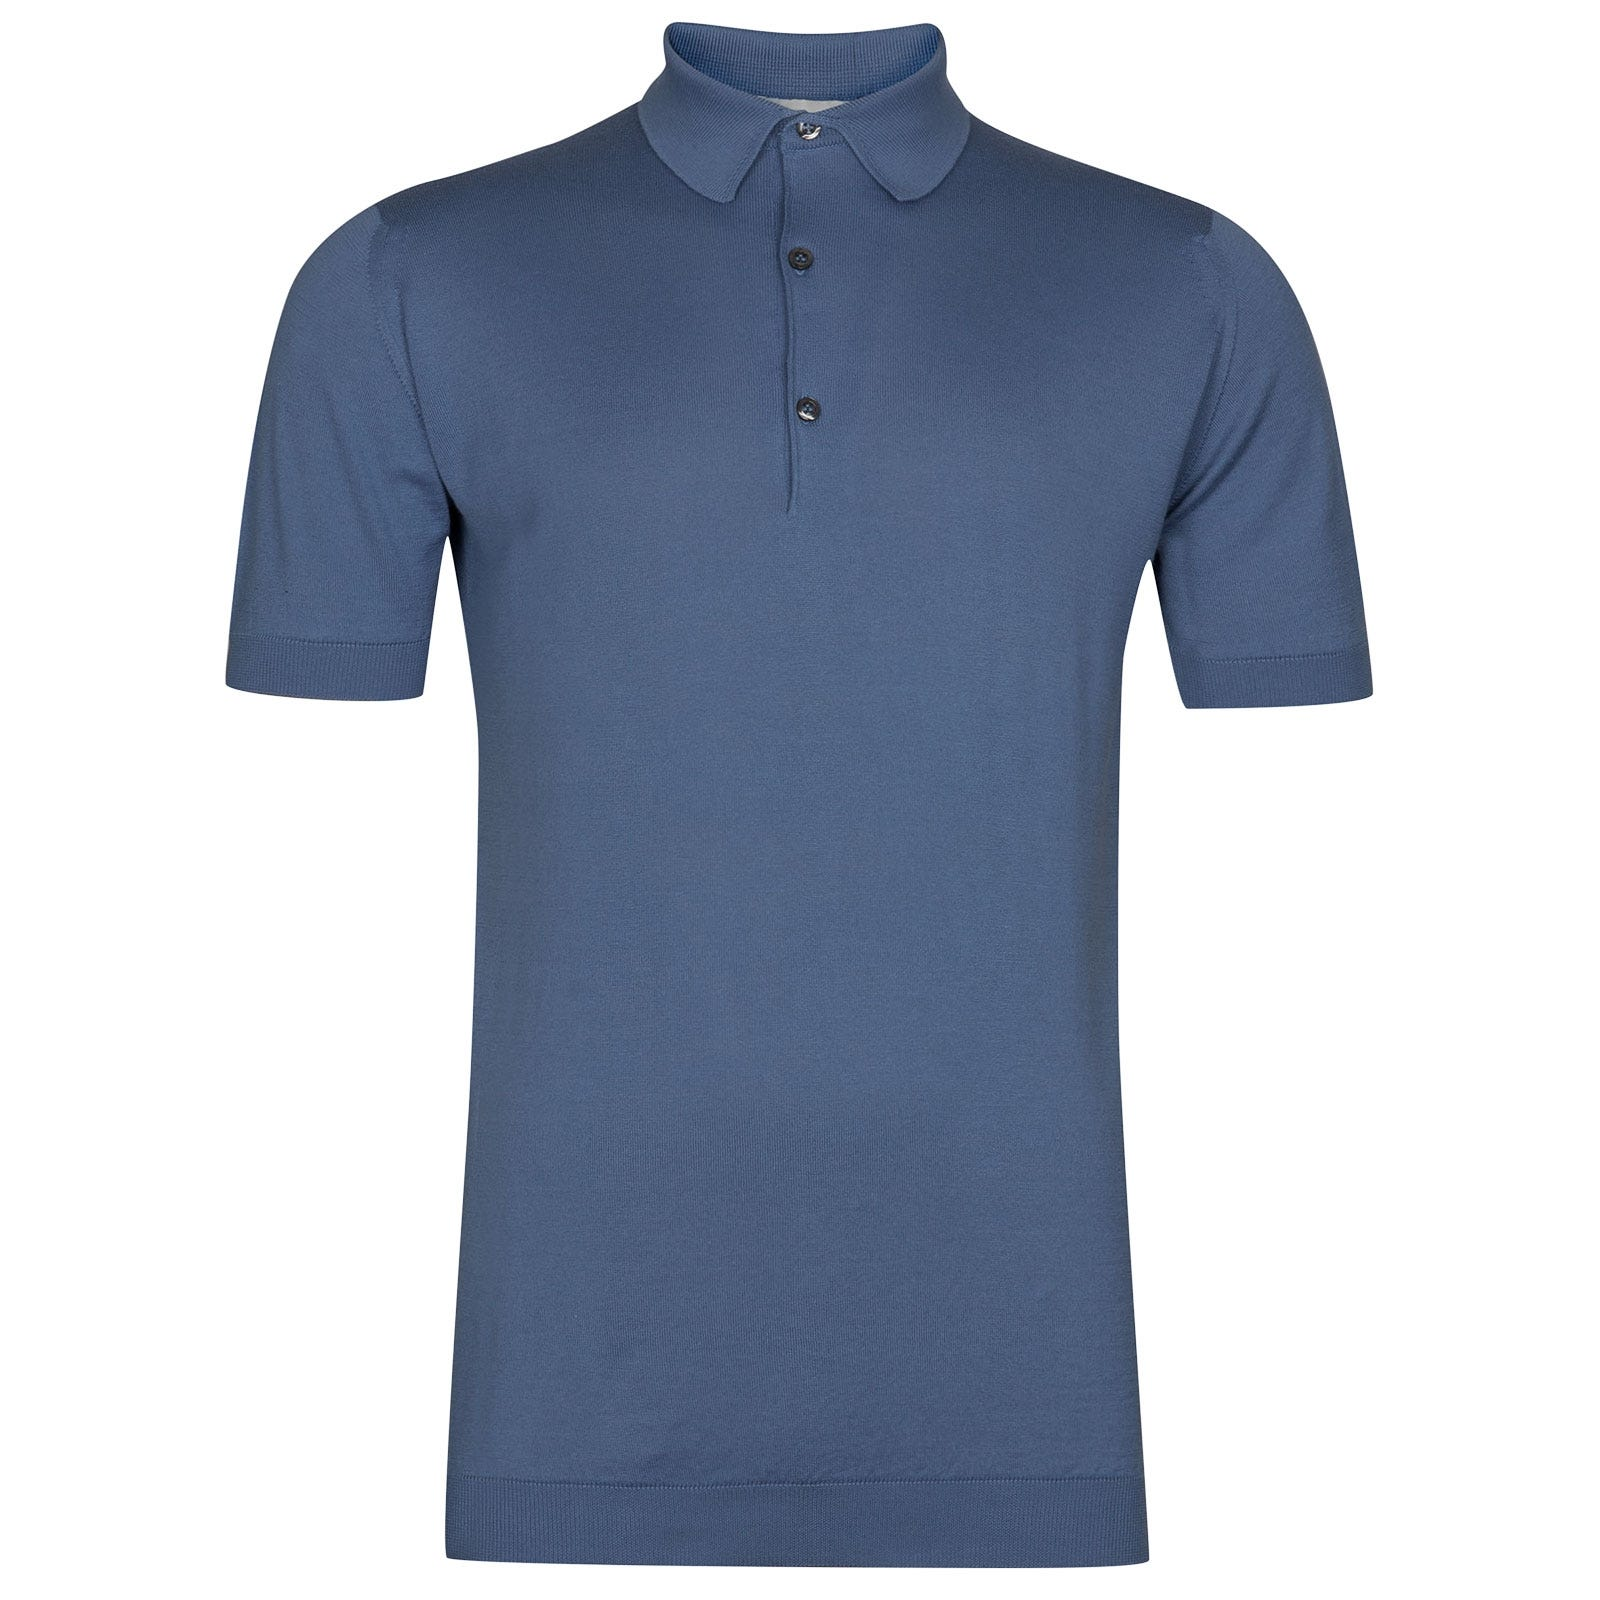 John Smedley Adrian in Blue Iris Shirt-LGE